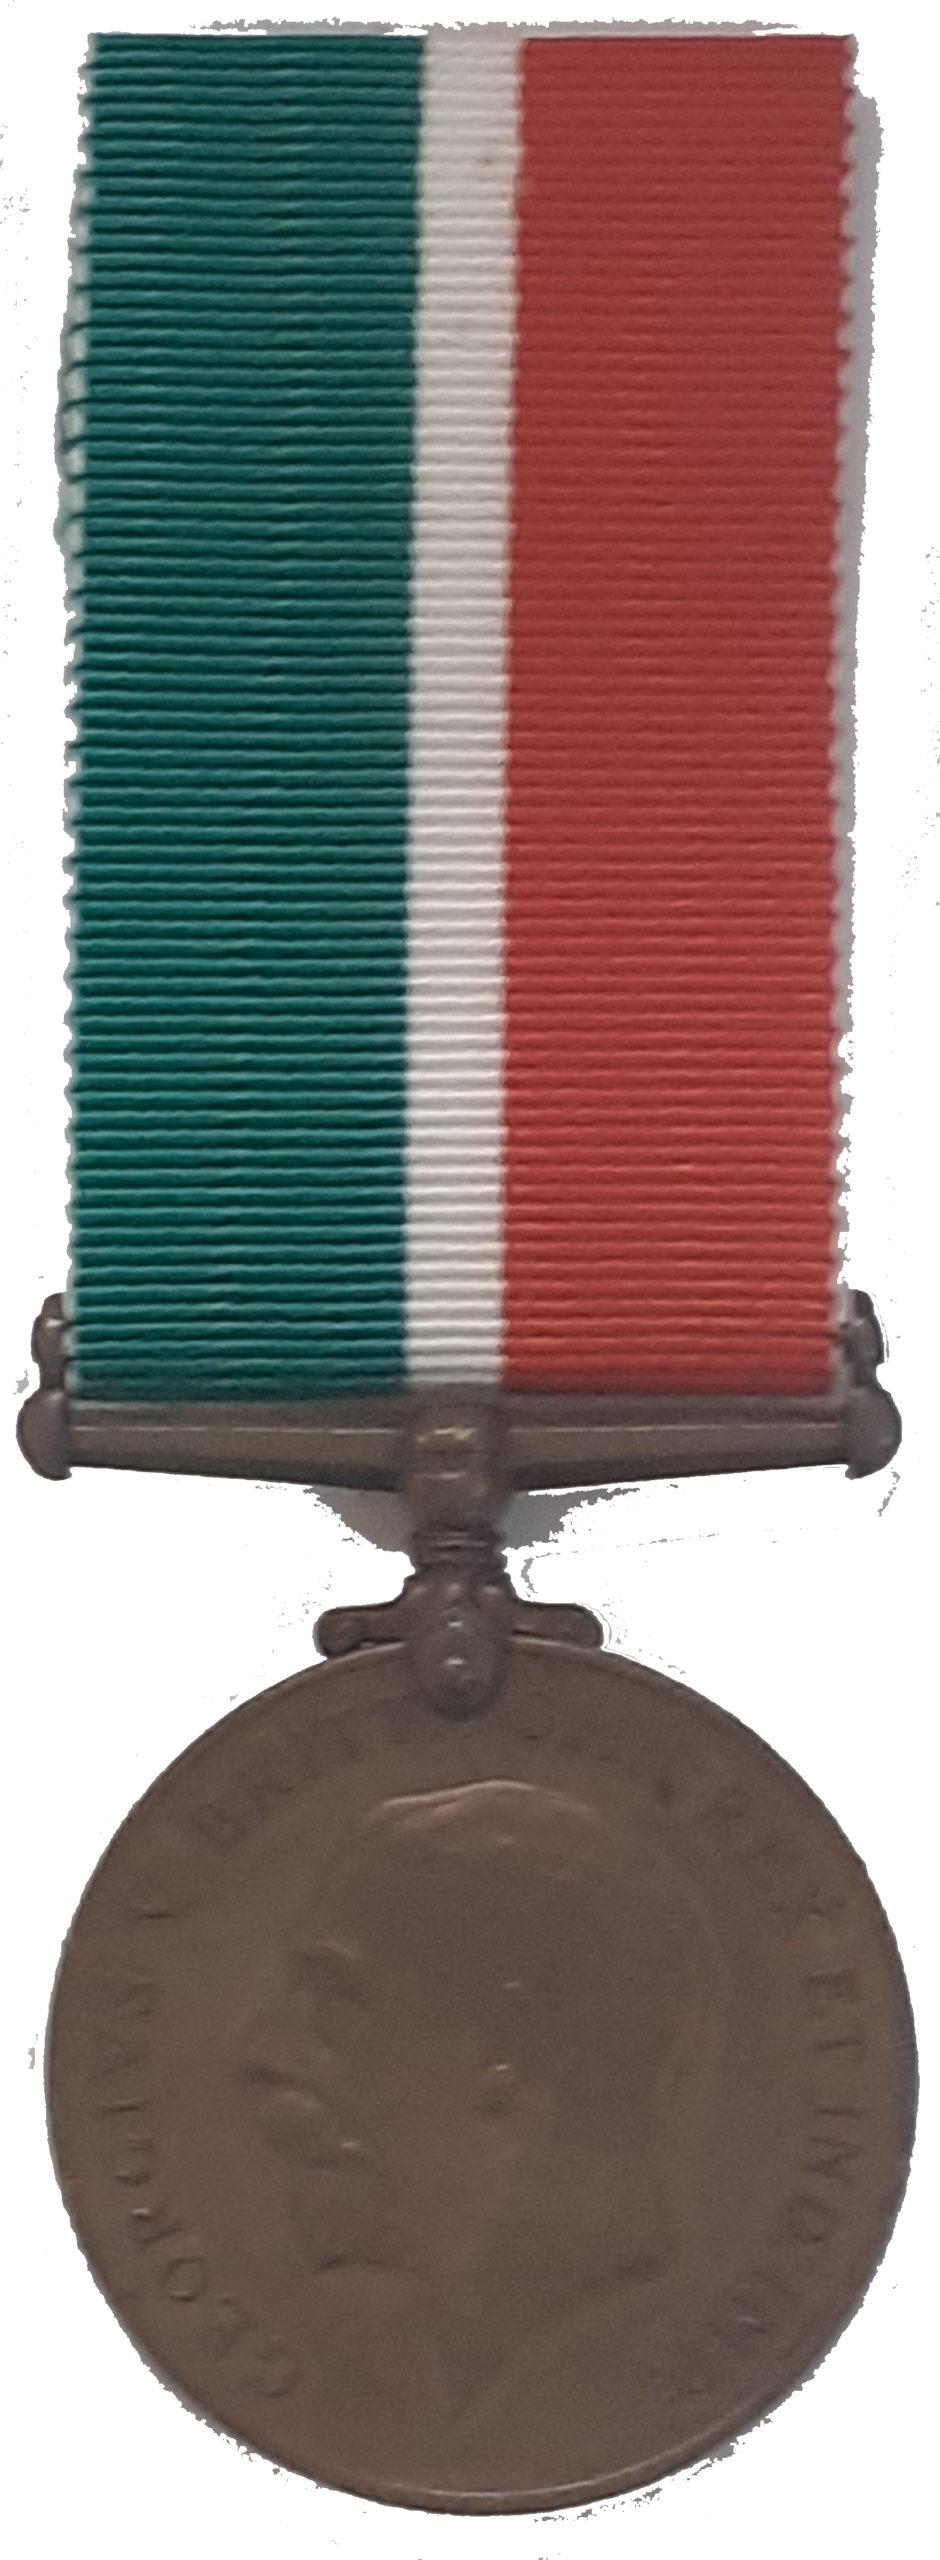 Mercantile Marine War Medal, 1914-1918, (Charles Appleford)